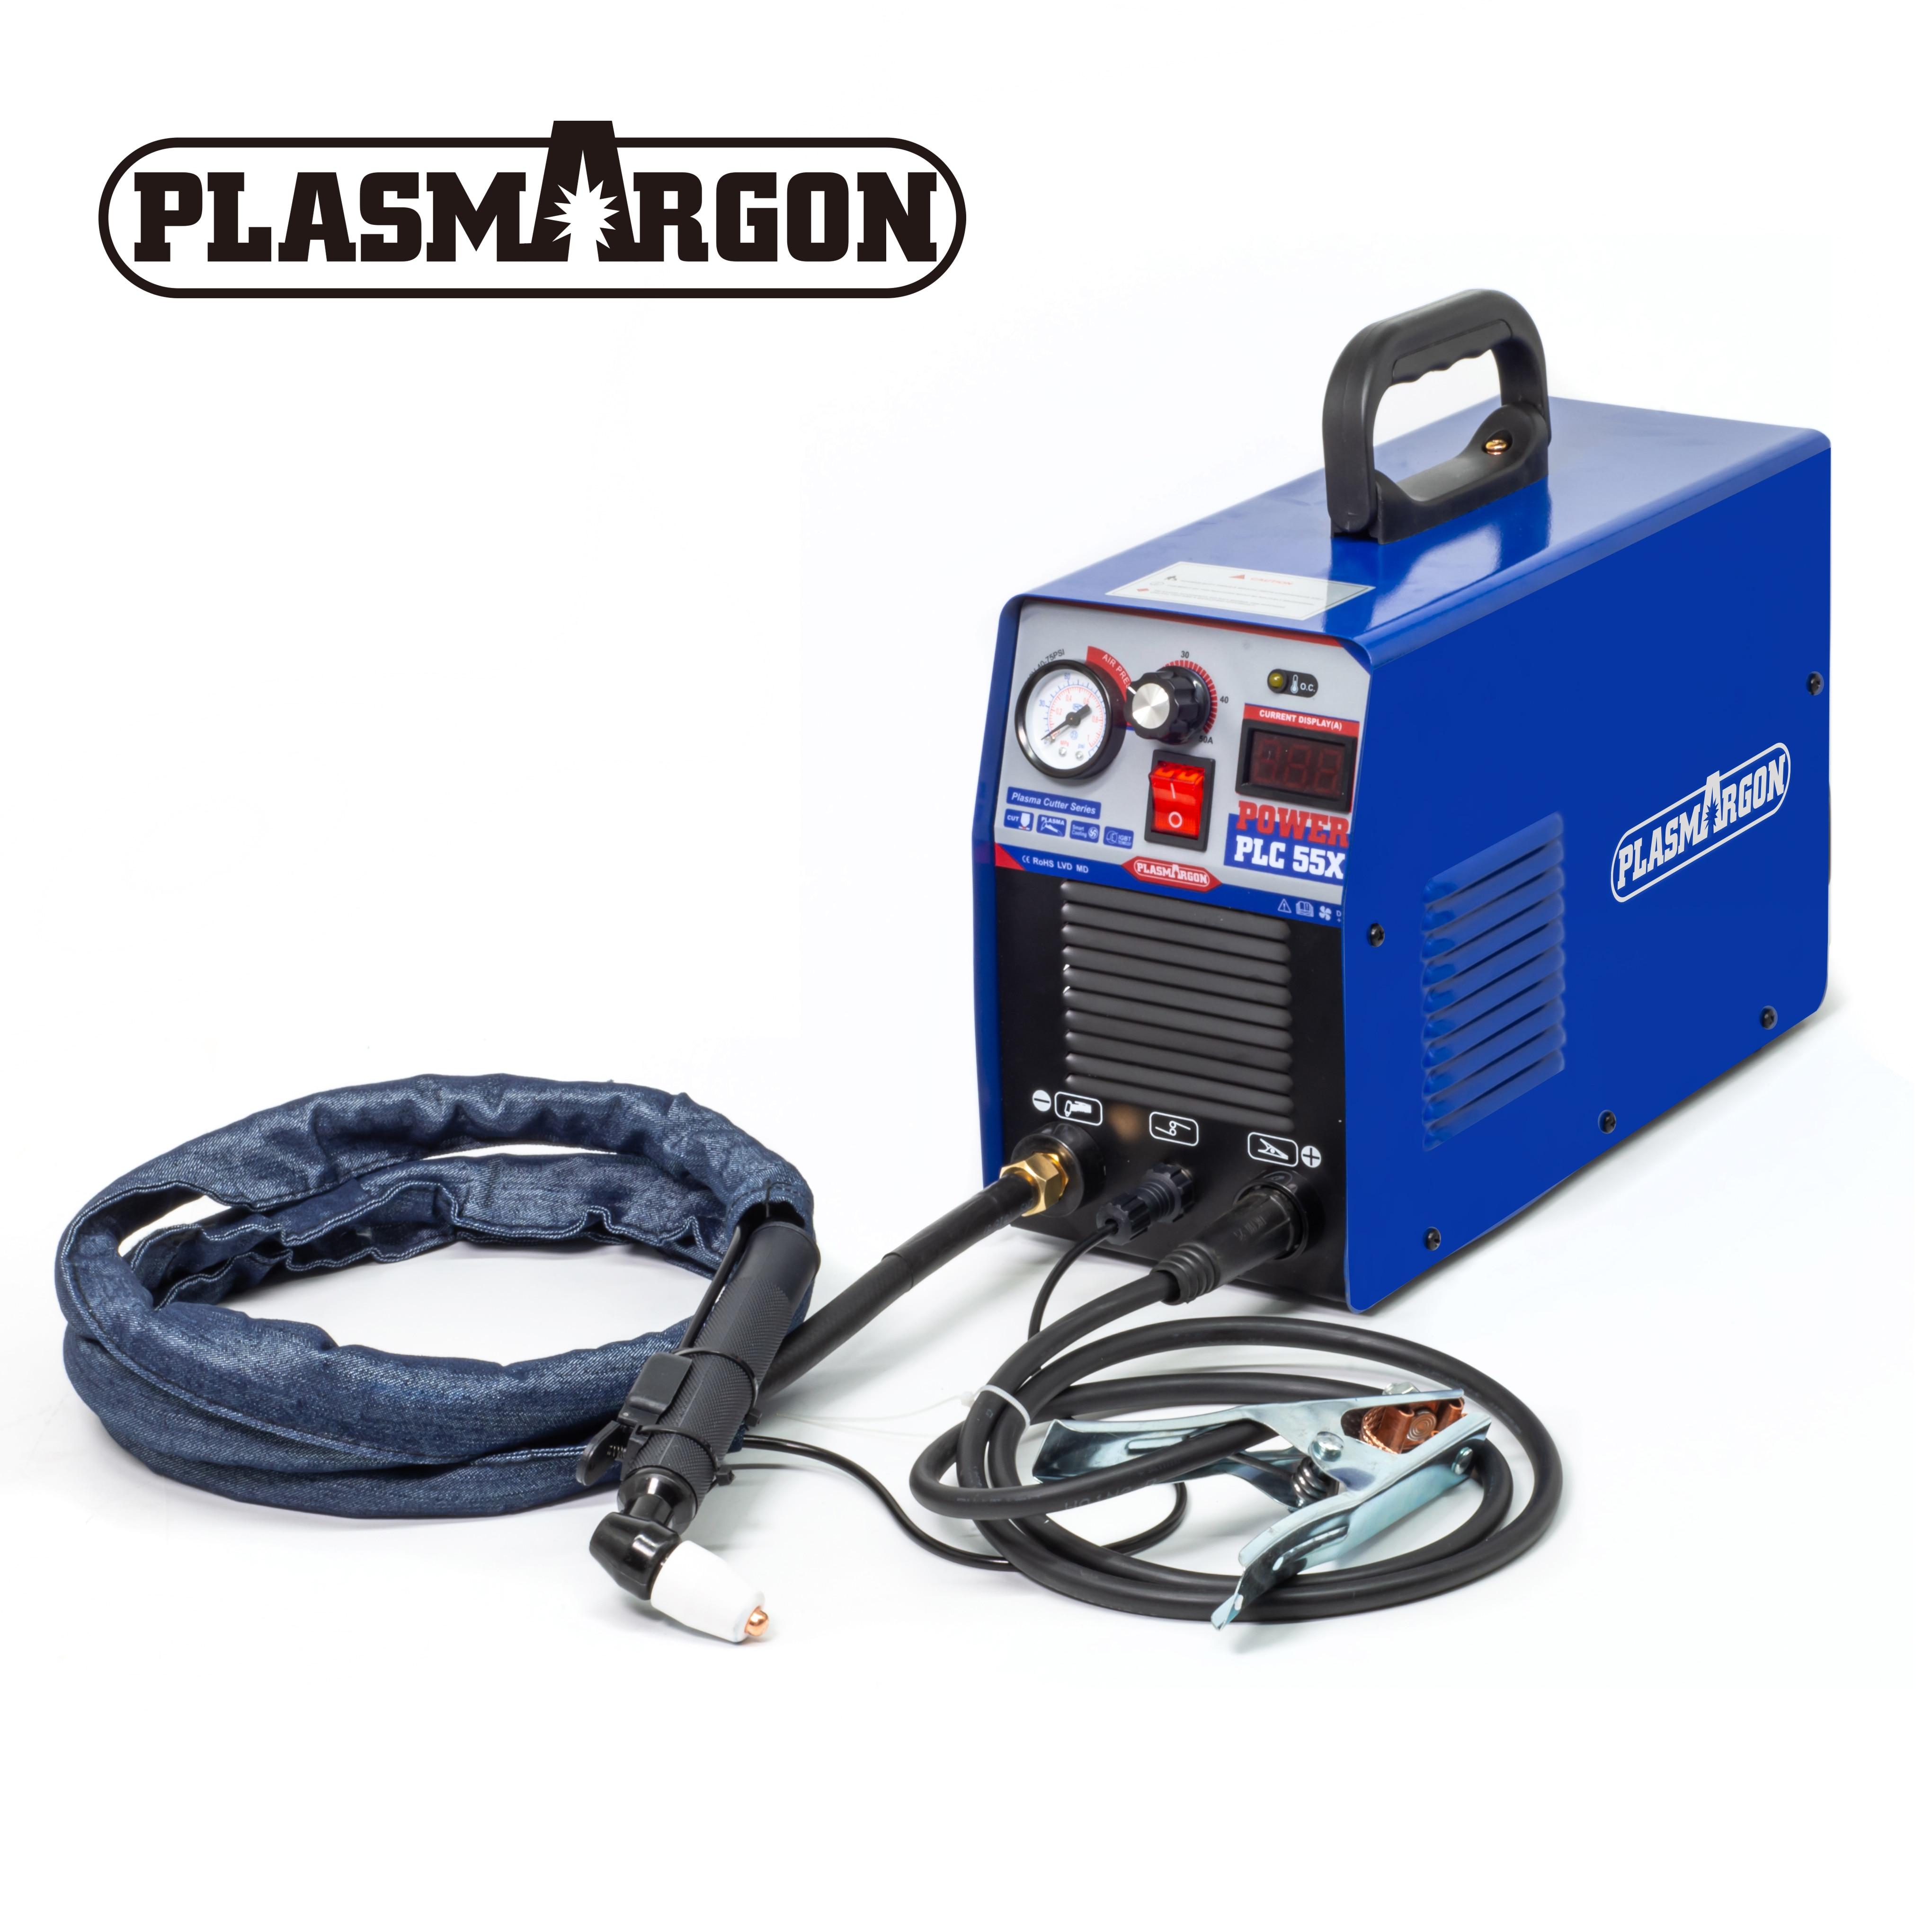 IGBT Plasma Cutting Machine 220V DC 50Amp Inverter Air Plasma Cutter Cut Thickness 12mm Clean Cut